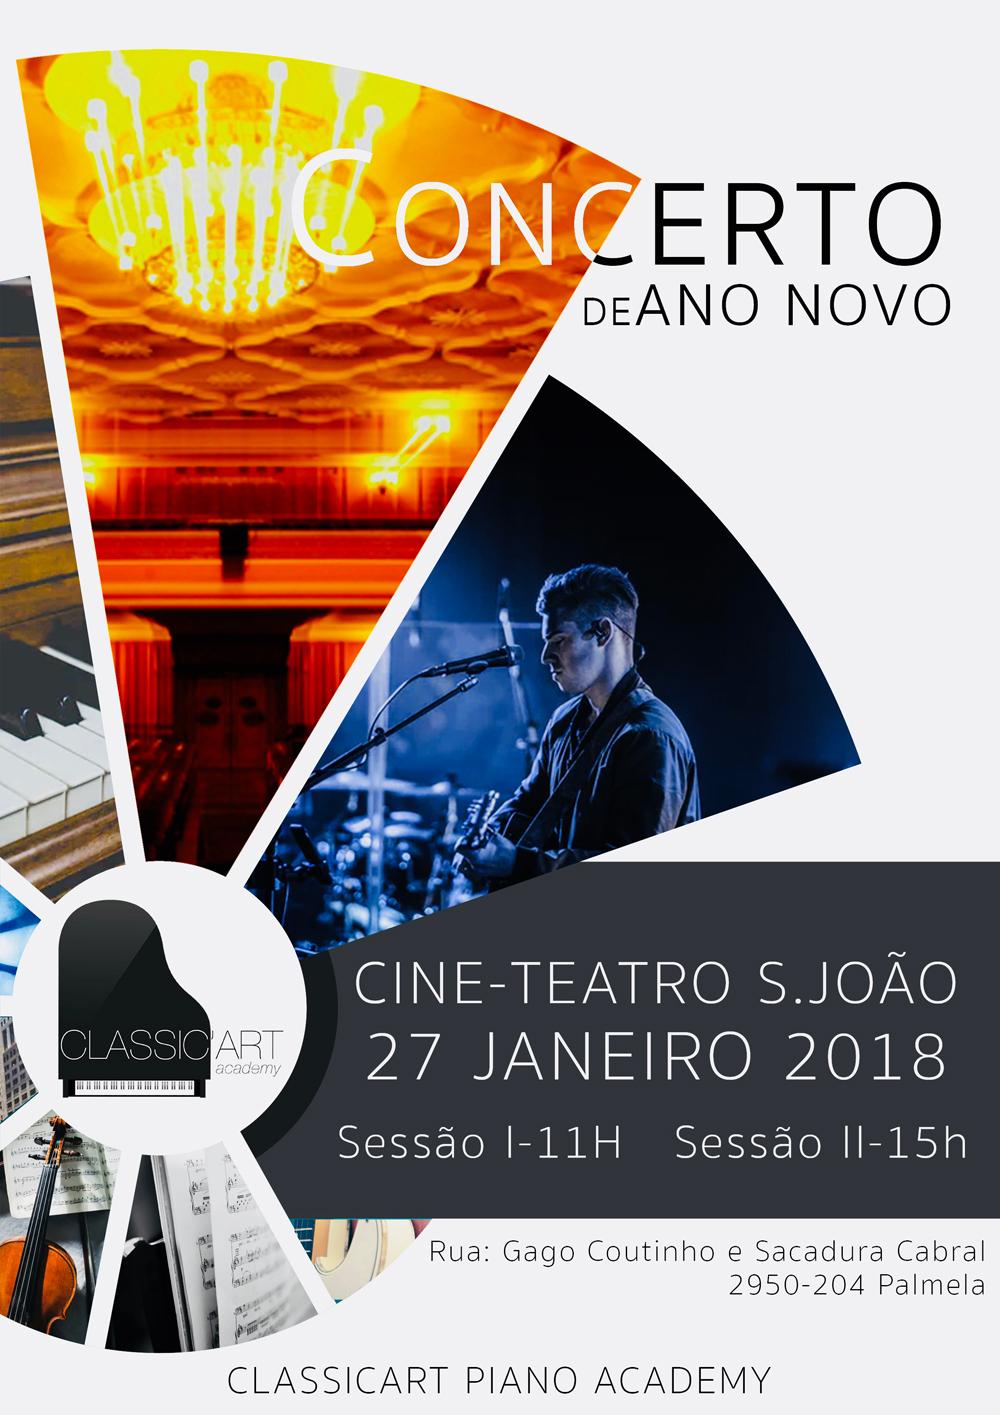 Concerto ano novo classicart piano academy 1 1024 2500